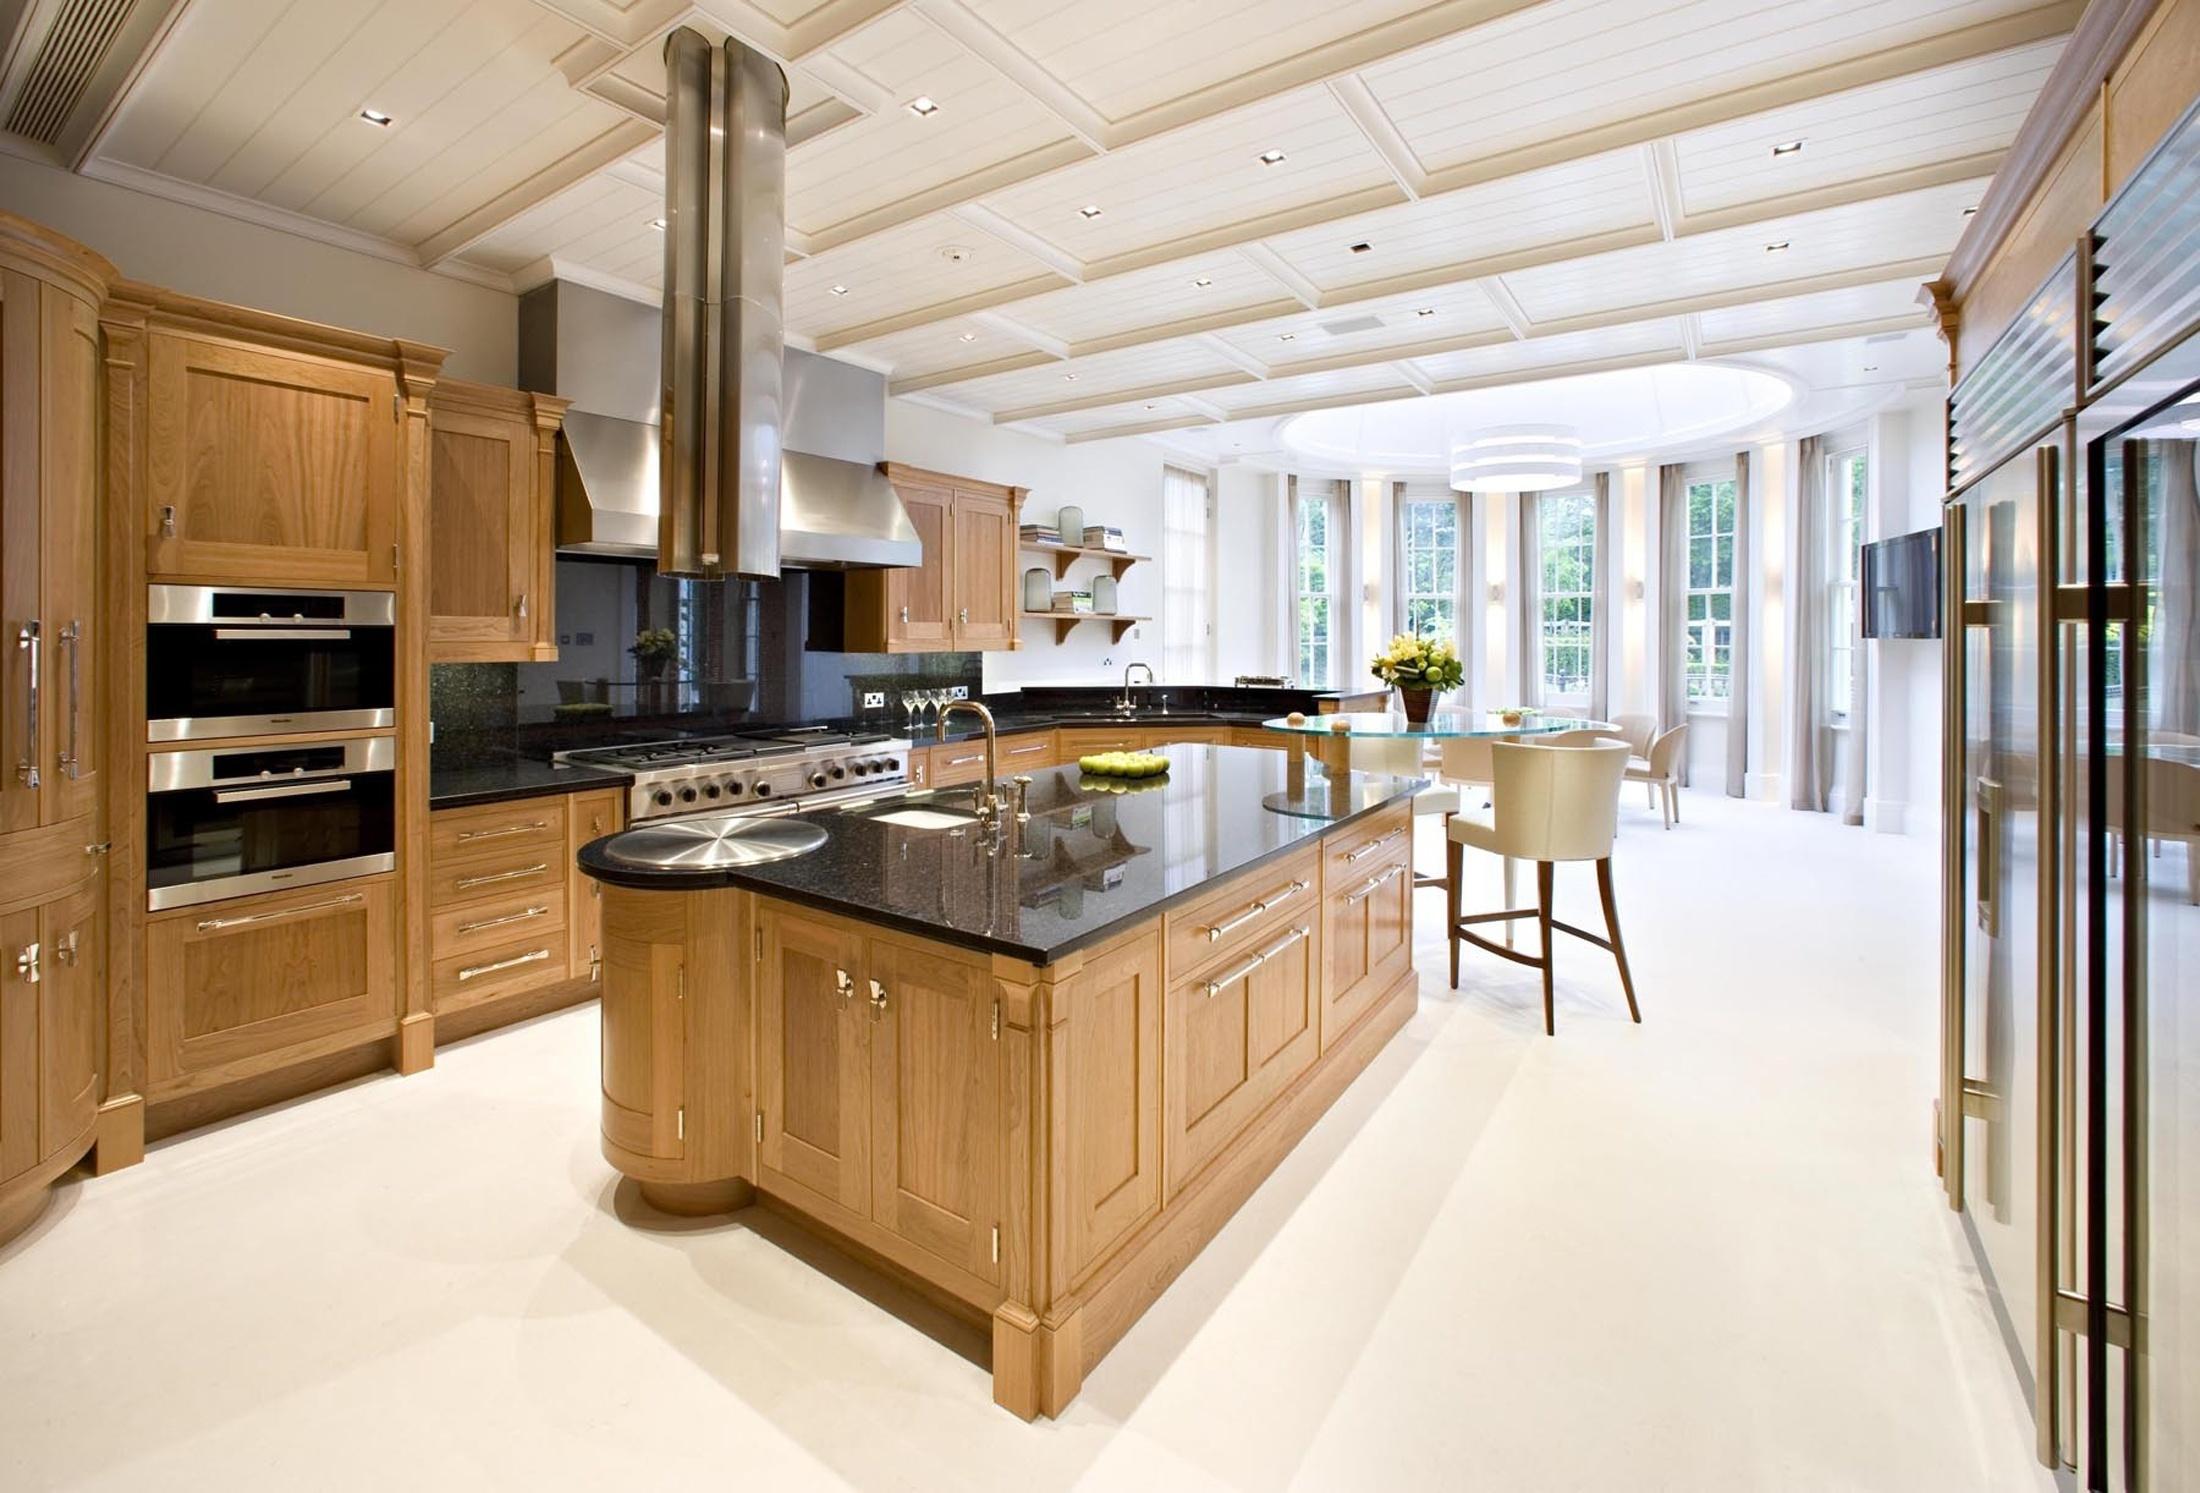 Israeli Billionaire Buys UK 39 S Most Expensive House